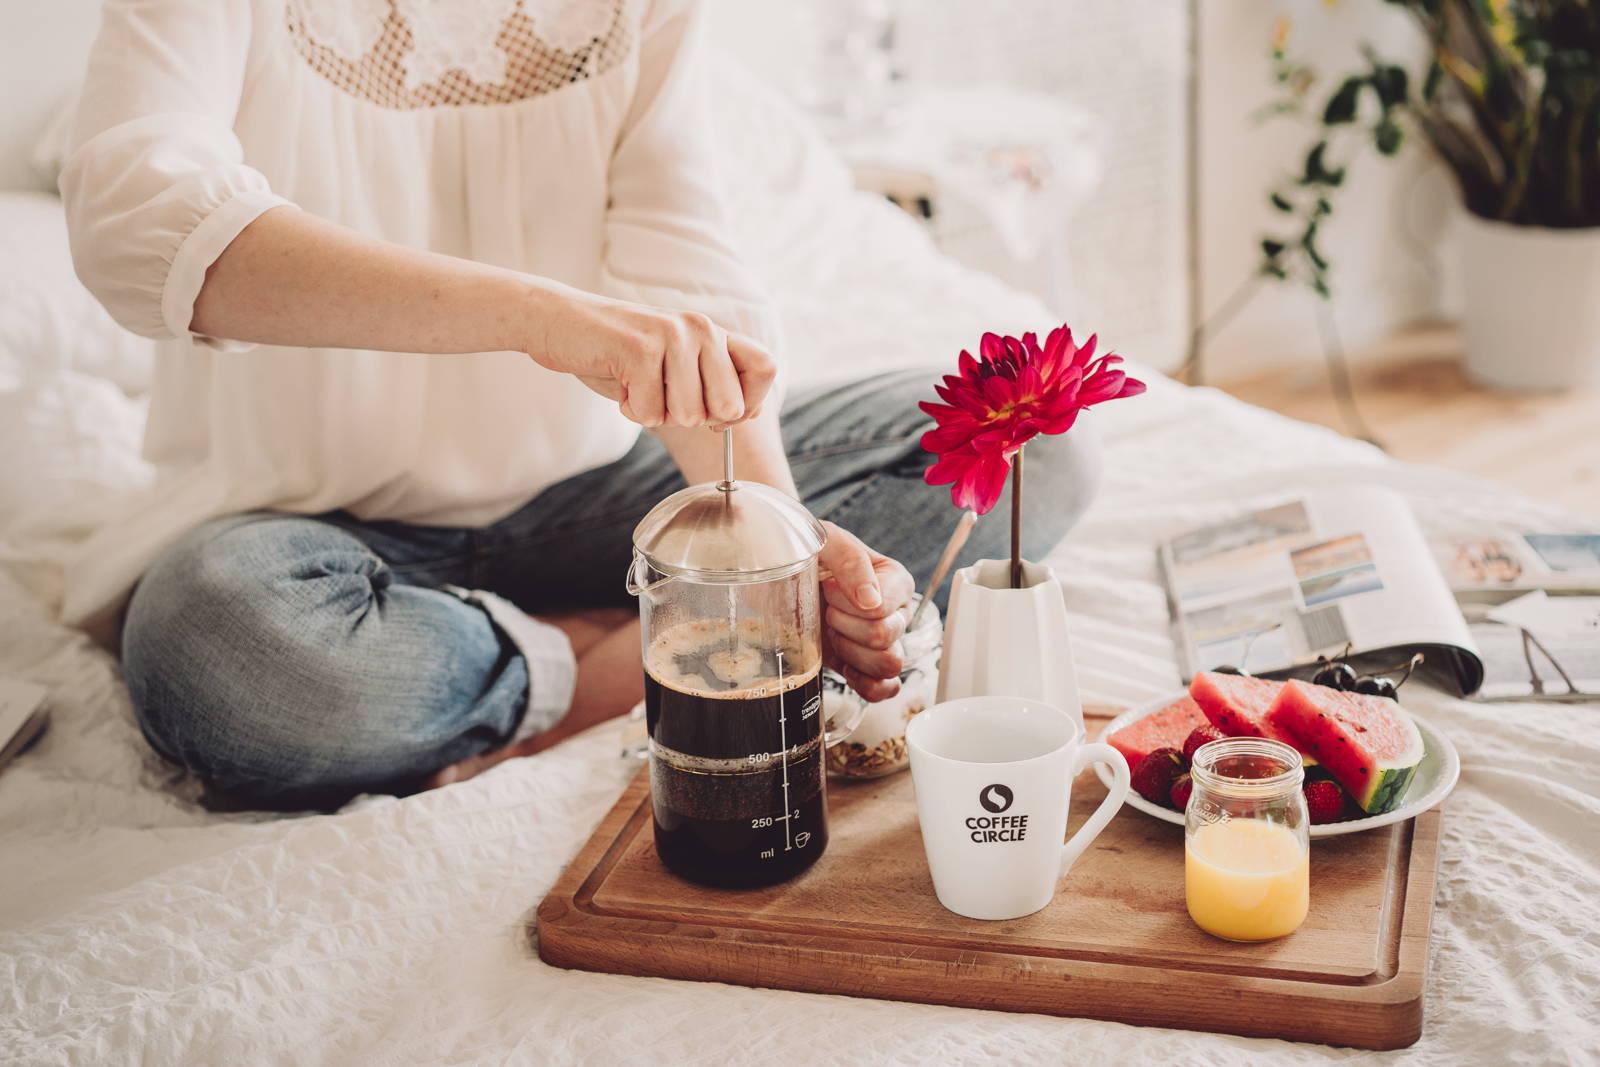 kaffee f r die french press online kaufen coffee circle. Black Bedroom Furniture Sets. Home Design Ideas